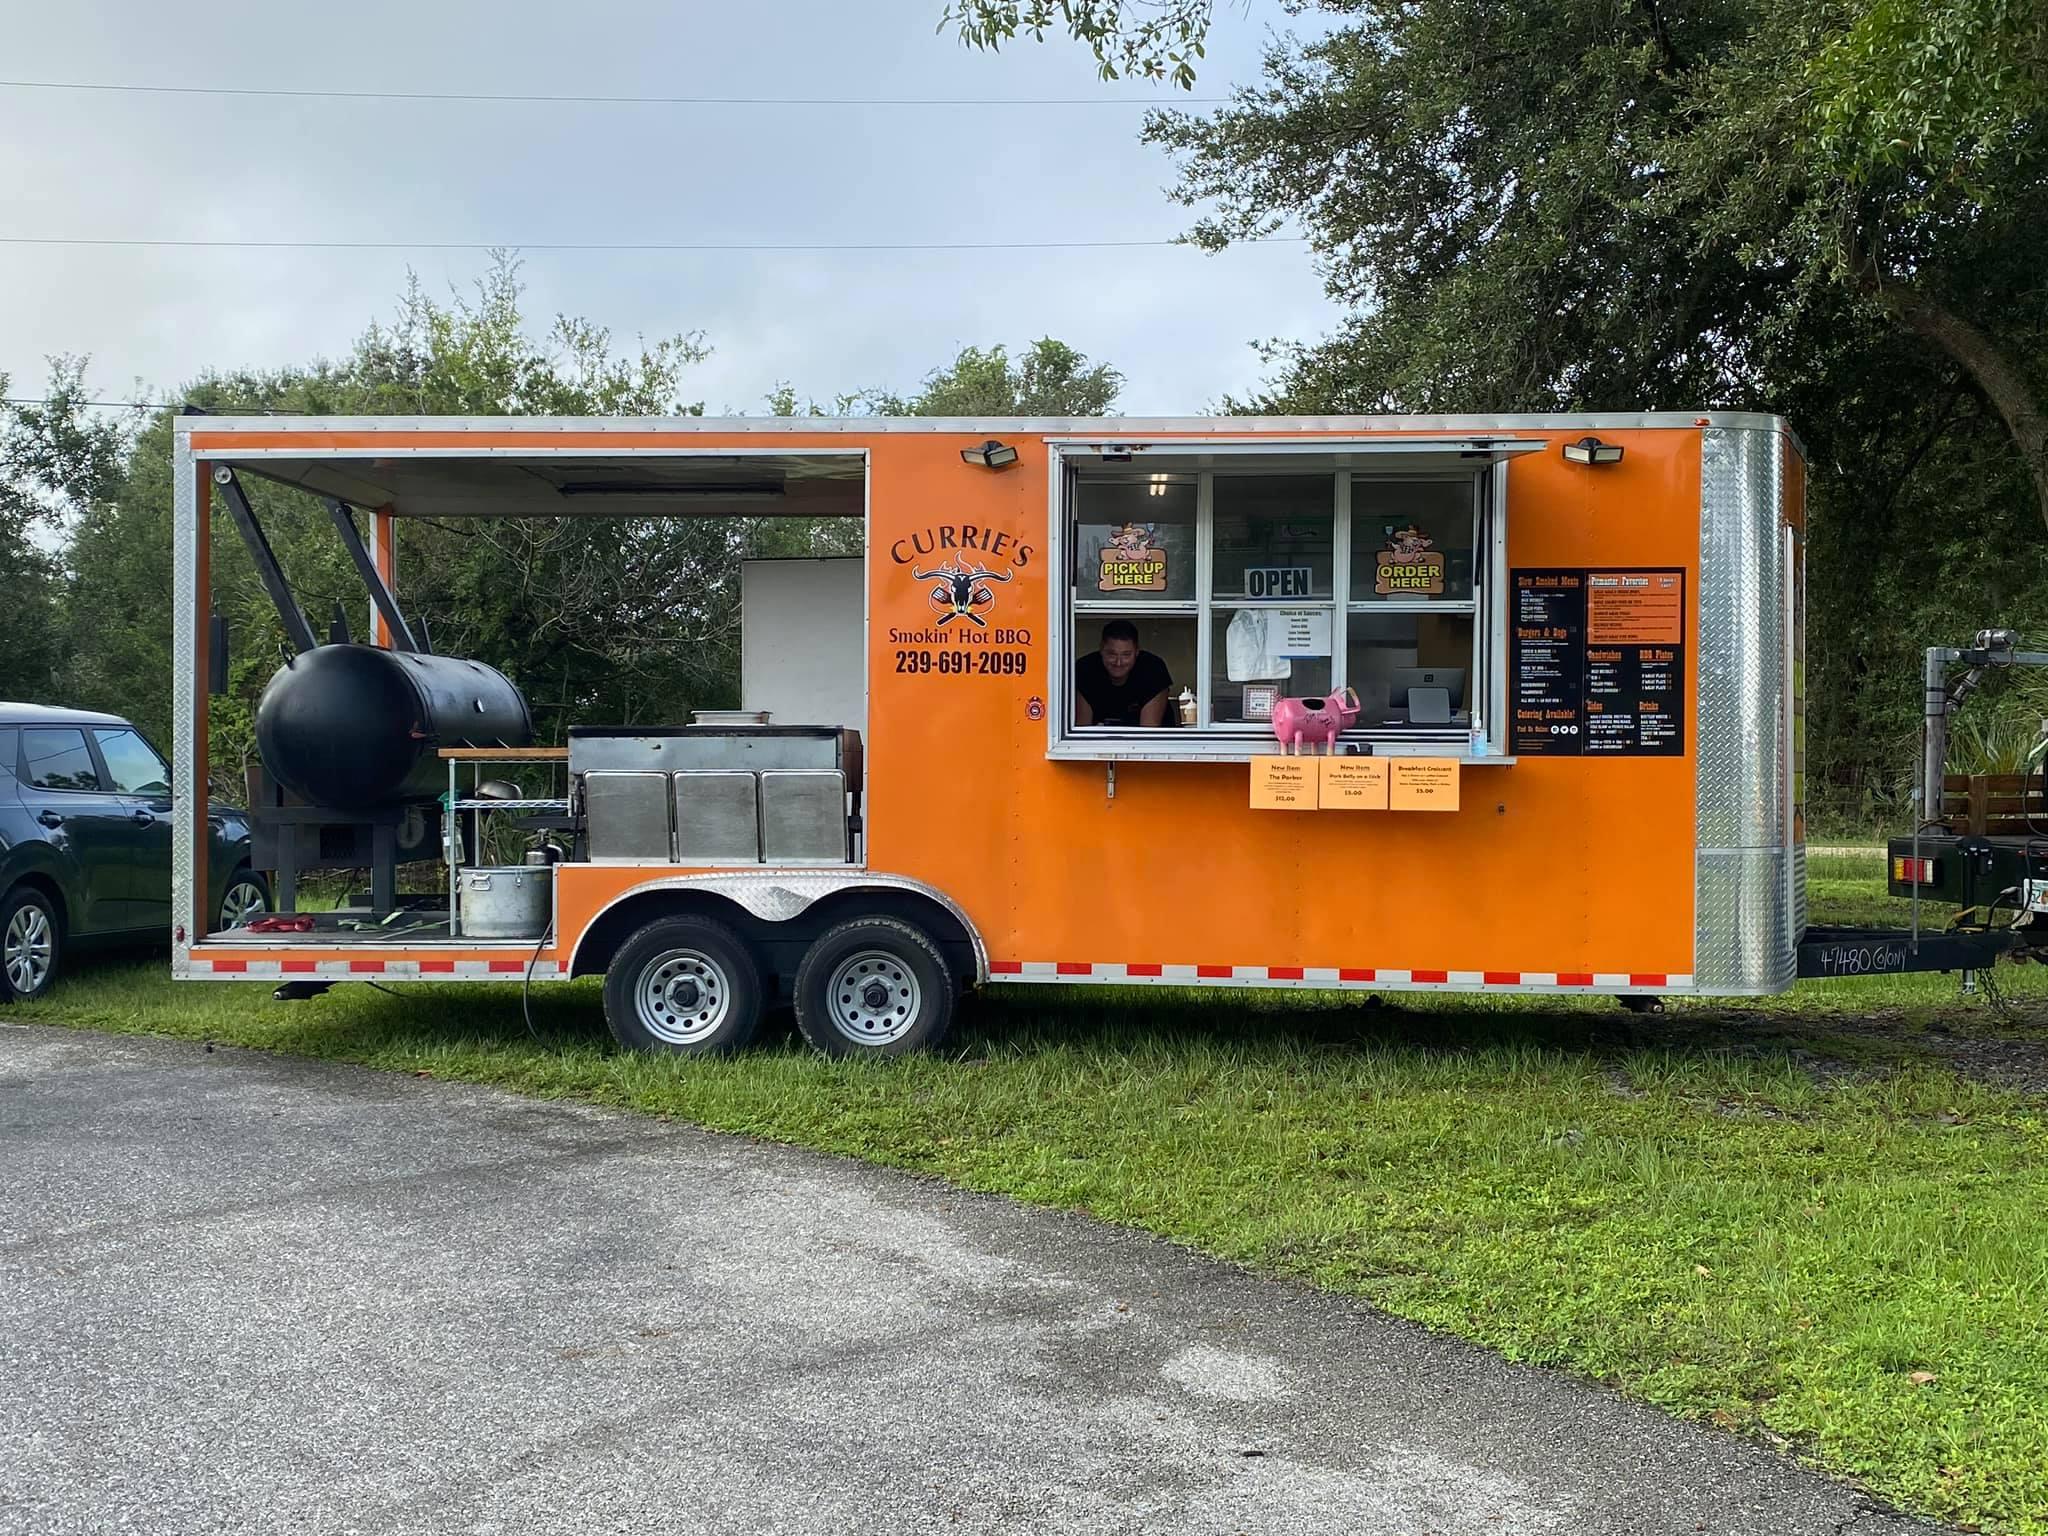 Currie's Smokin Hot BBQ Food Truck